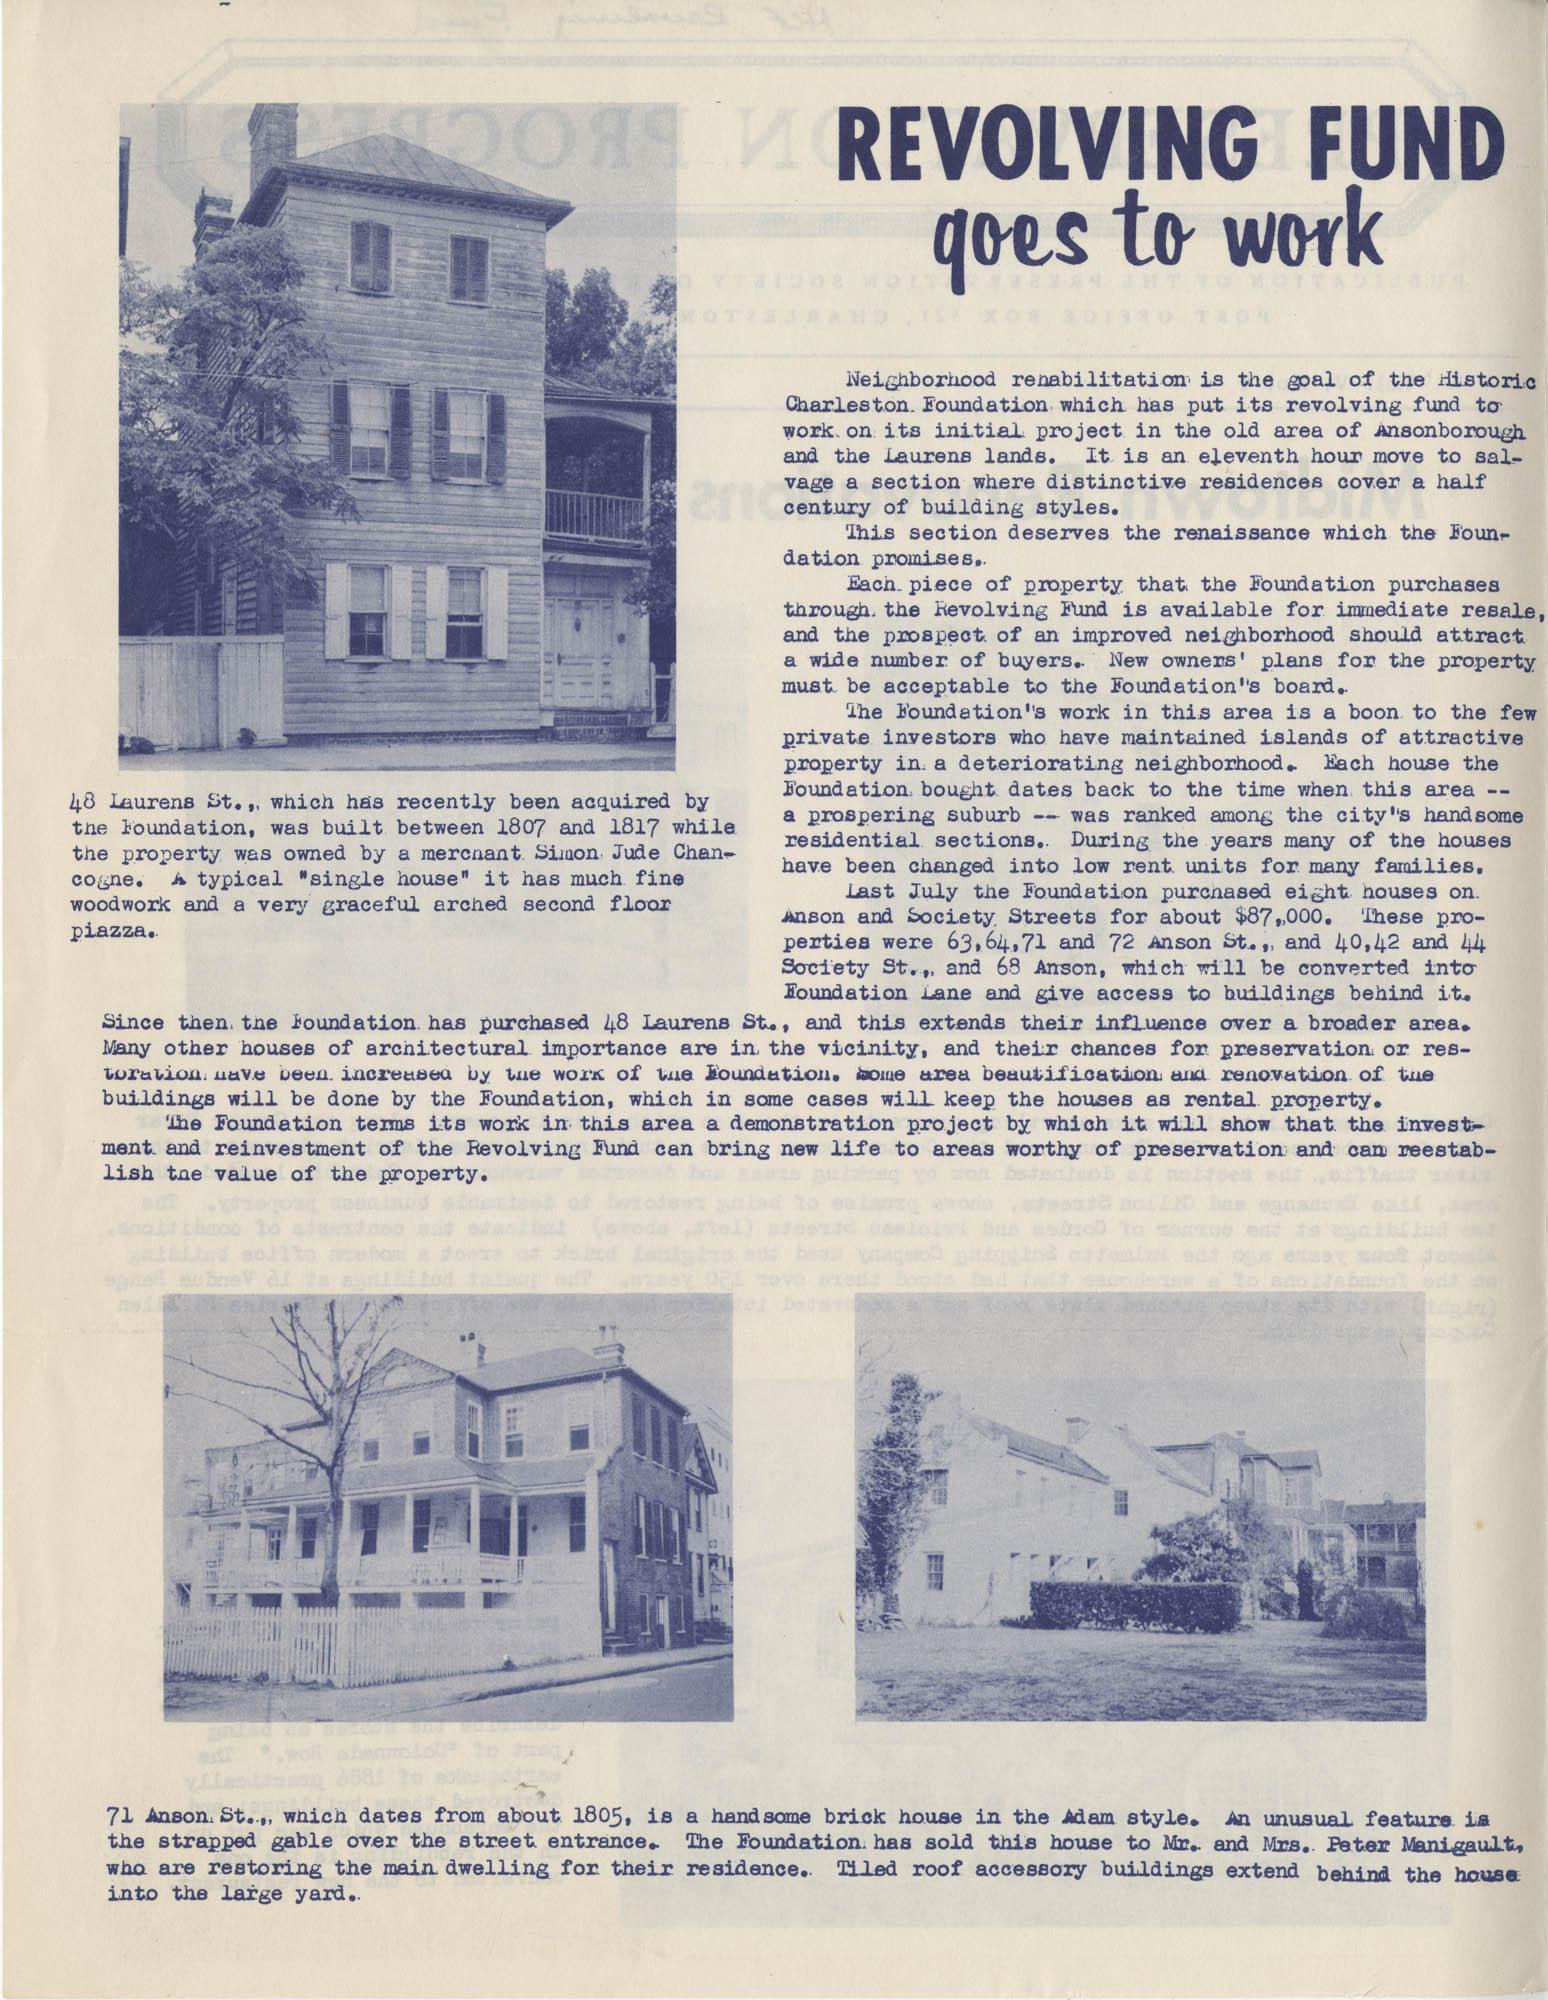 Preservation Progress, Vol. V, No. 1, Page 1